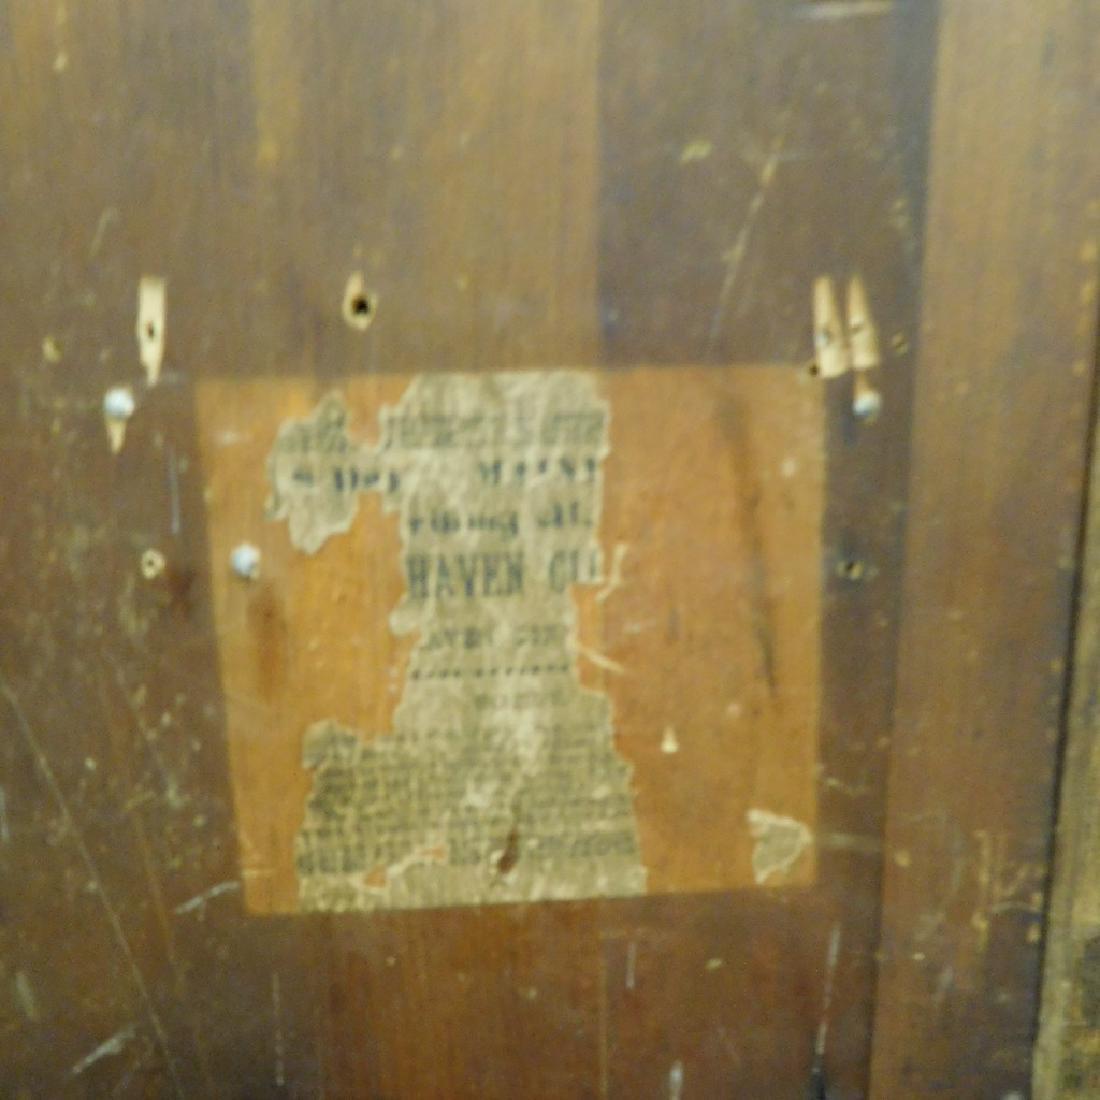 Antique New Haven Parlor Kitchen clock -Working . - 2